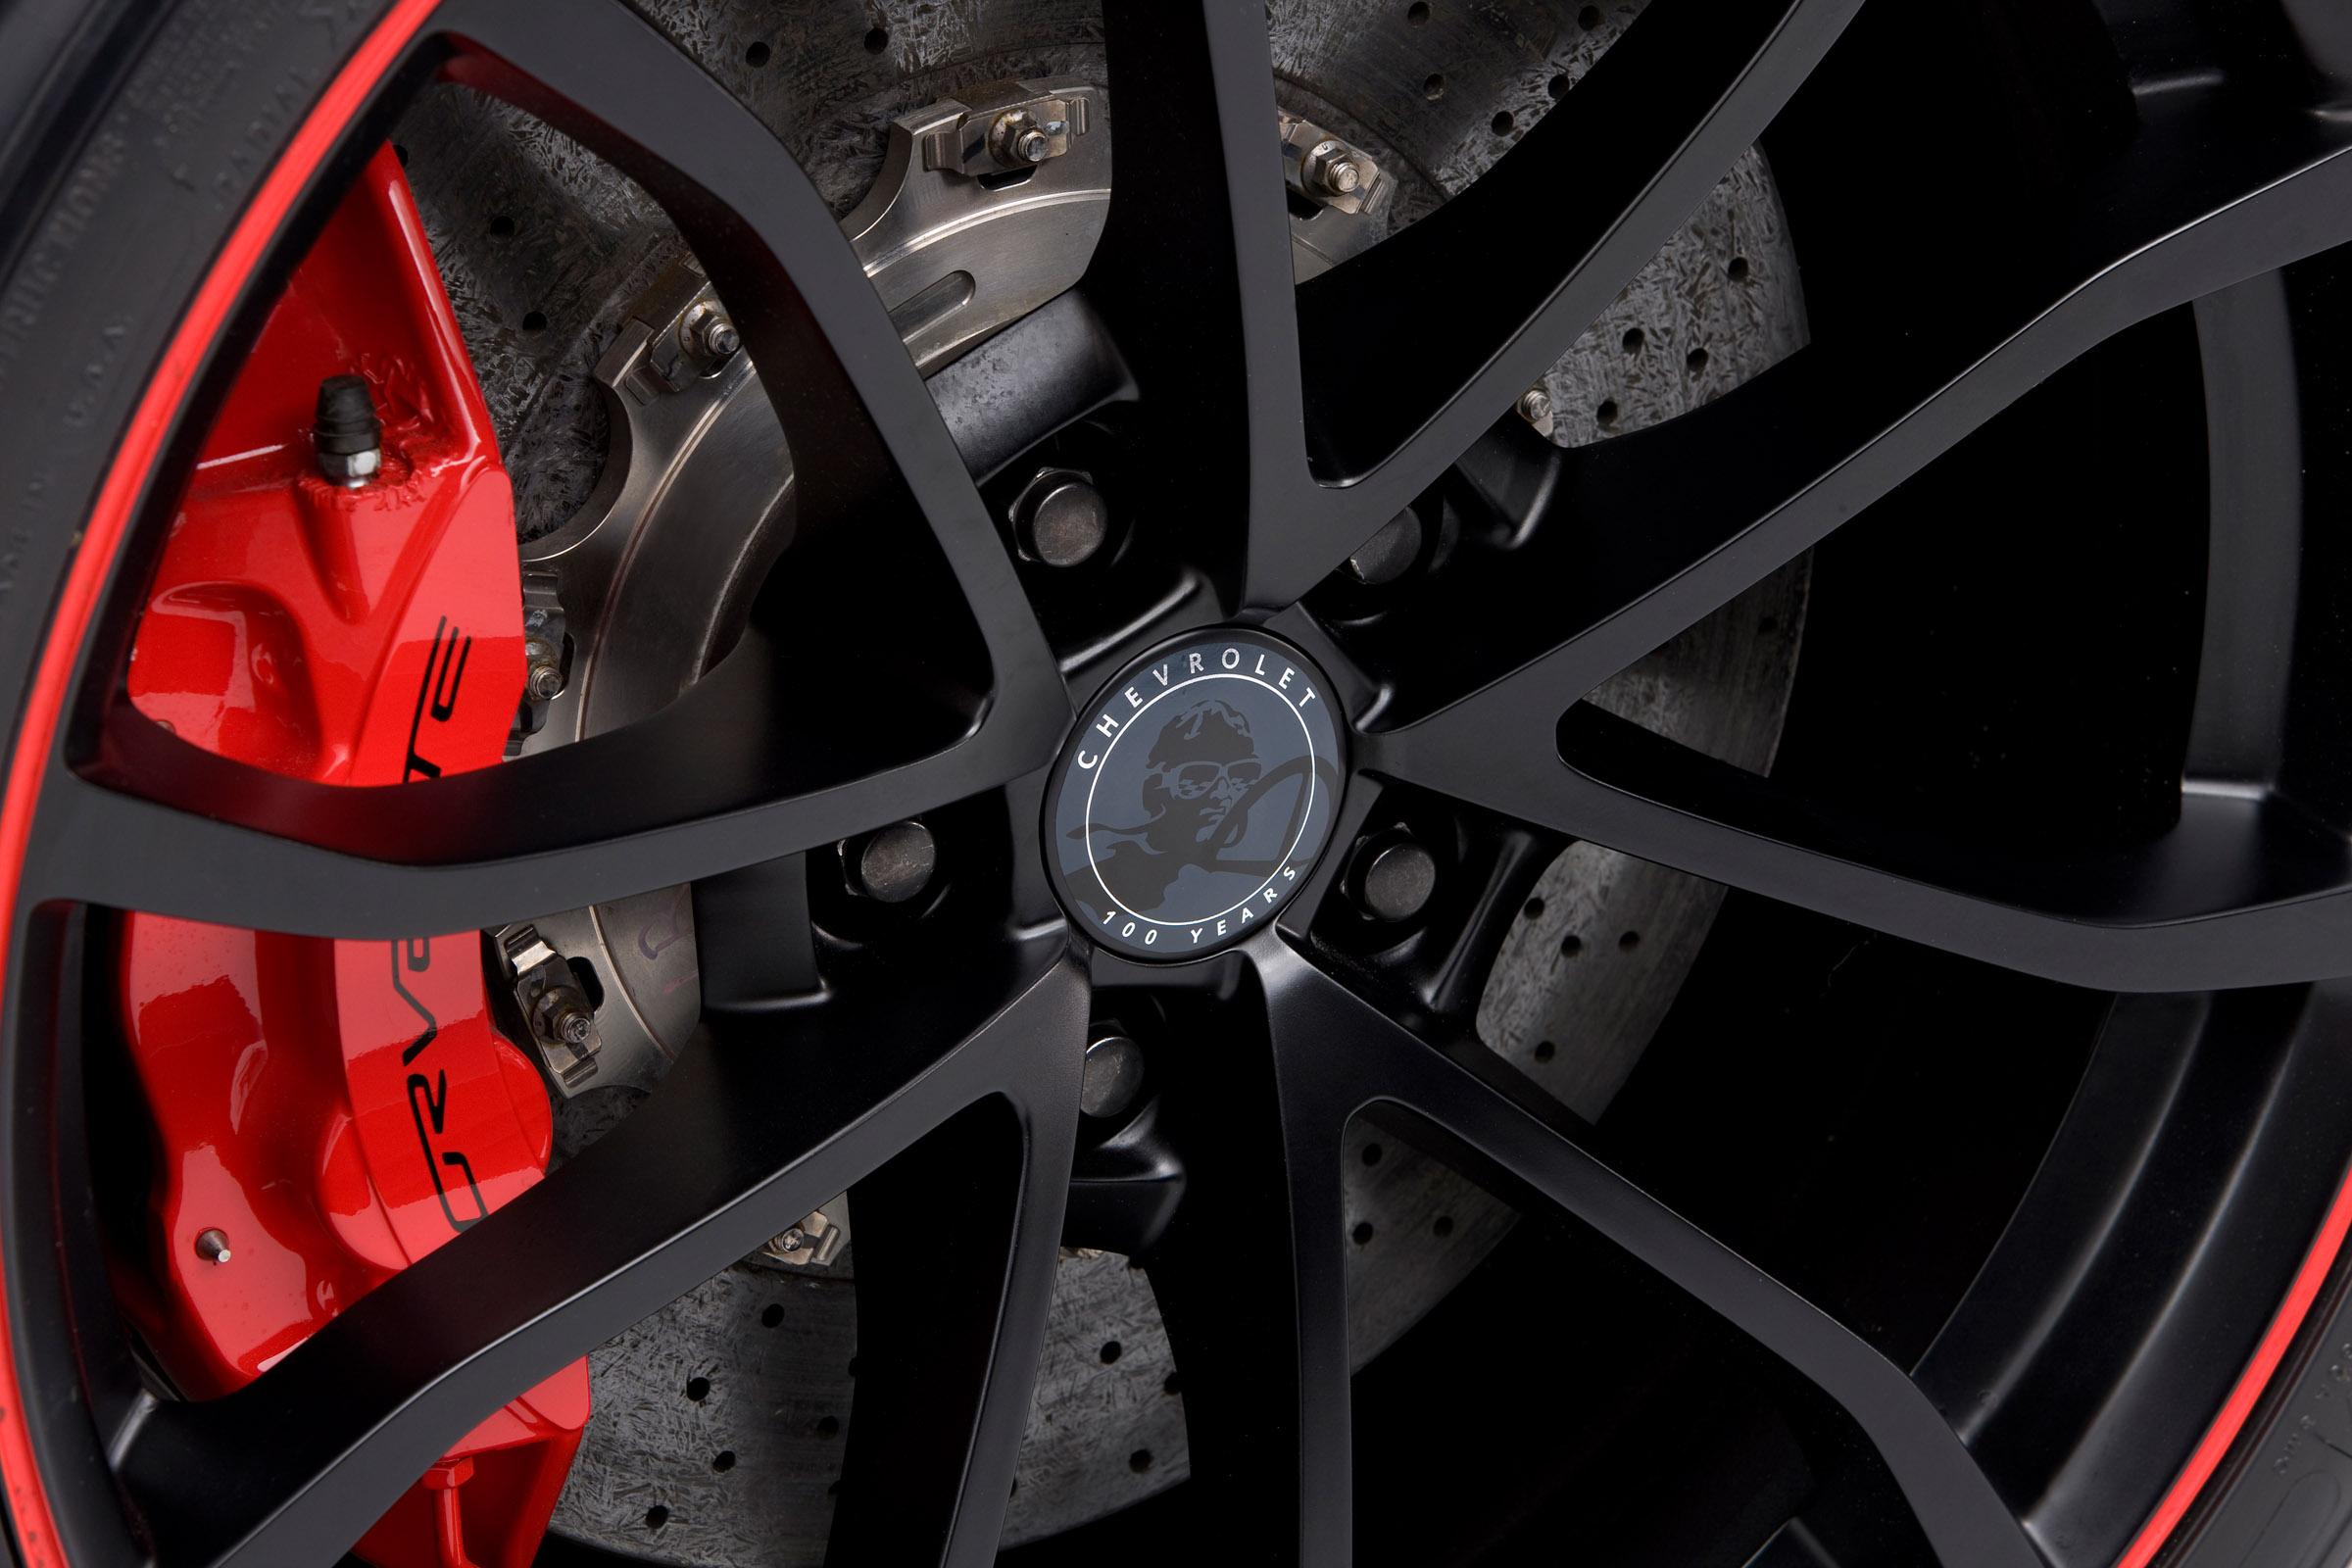 2012 Chevrolet Centennial Edition Corvette Z06 Picture #3 of 9